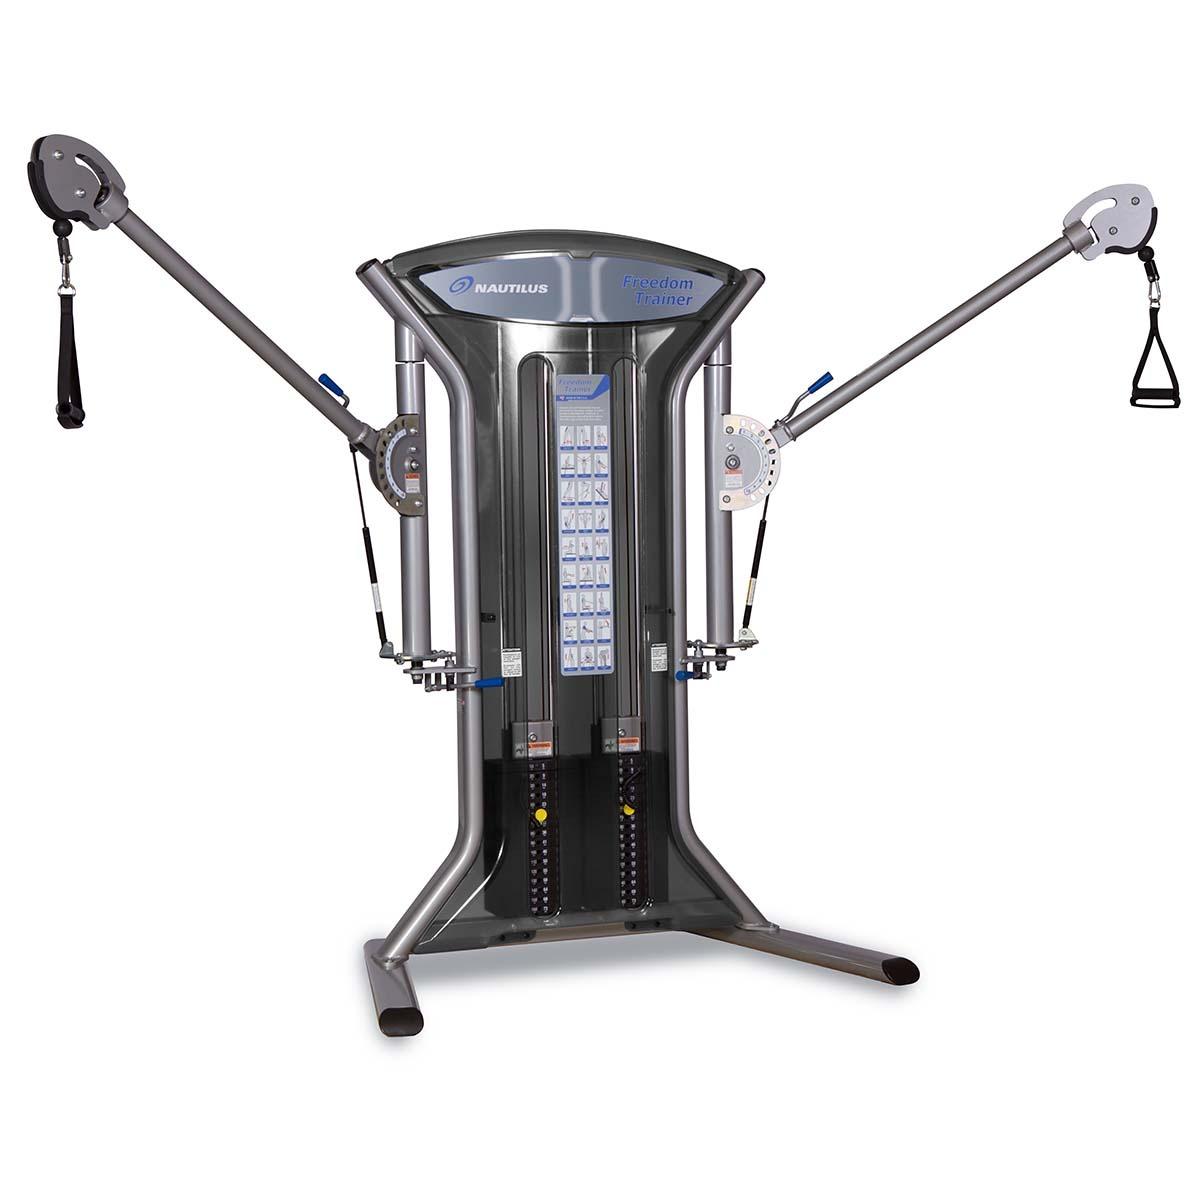 Surrey Strength Equipment - Nautilus Freedom Trainer - Lifestyle Equipment